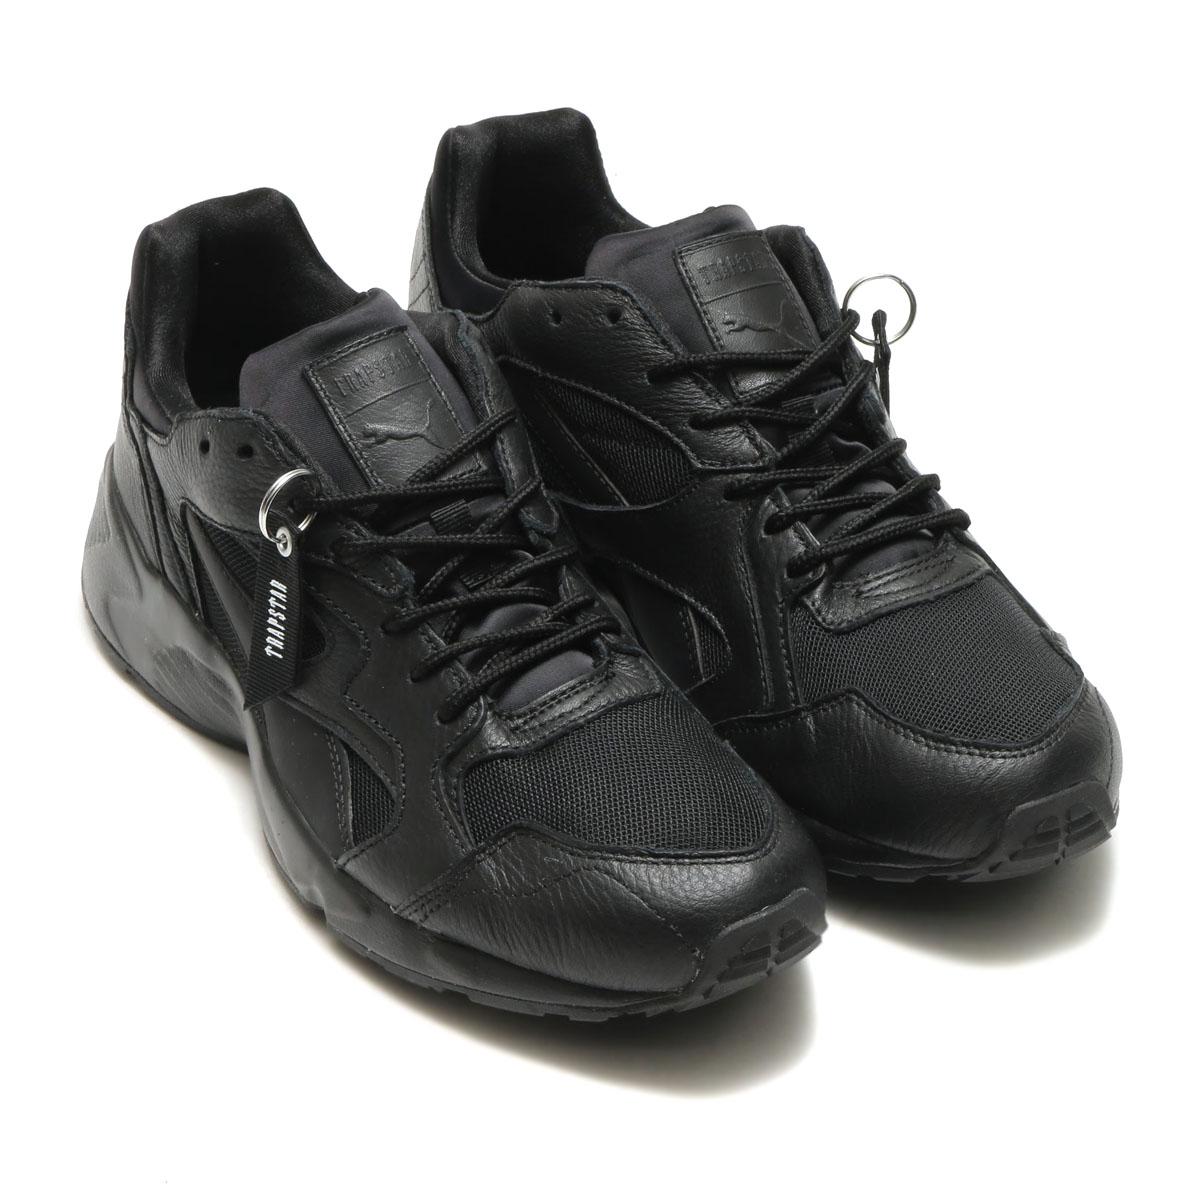 puma x trapstar shoes, OFF 78%,Buy!